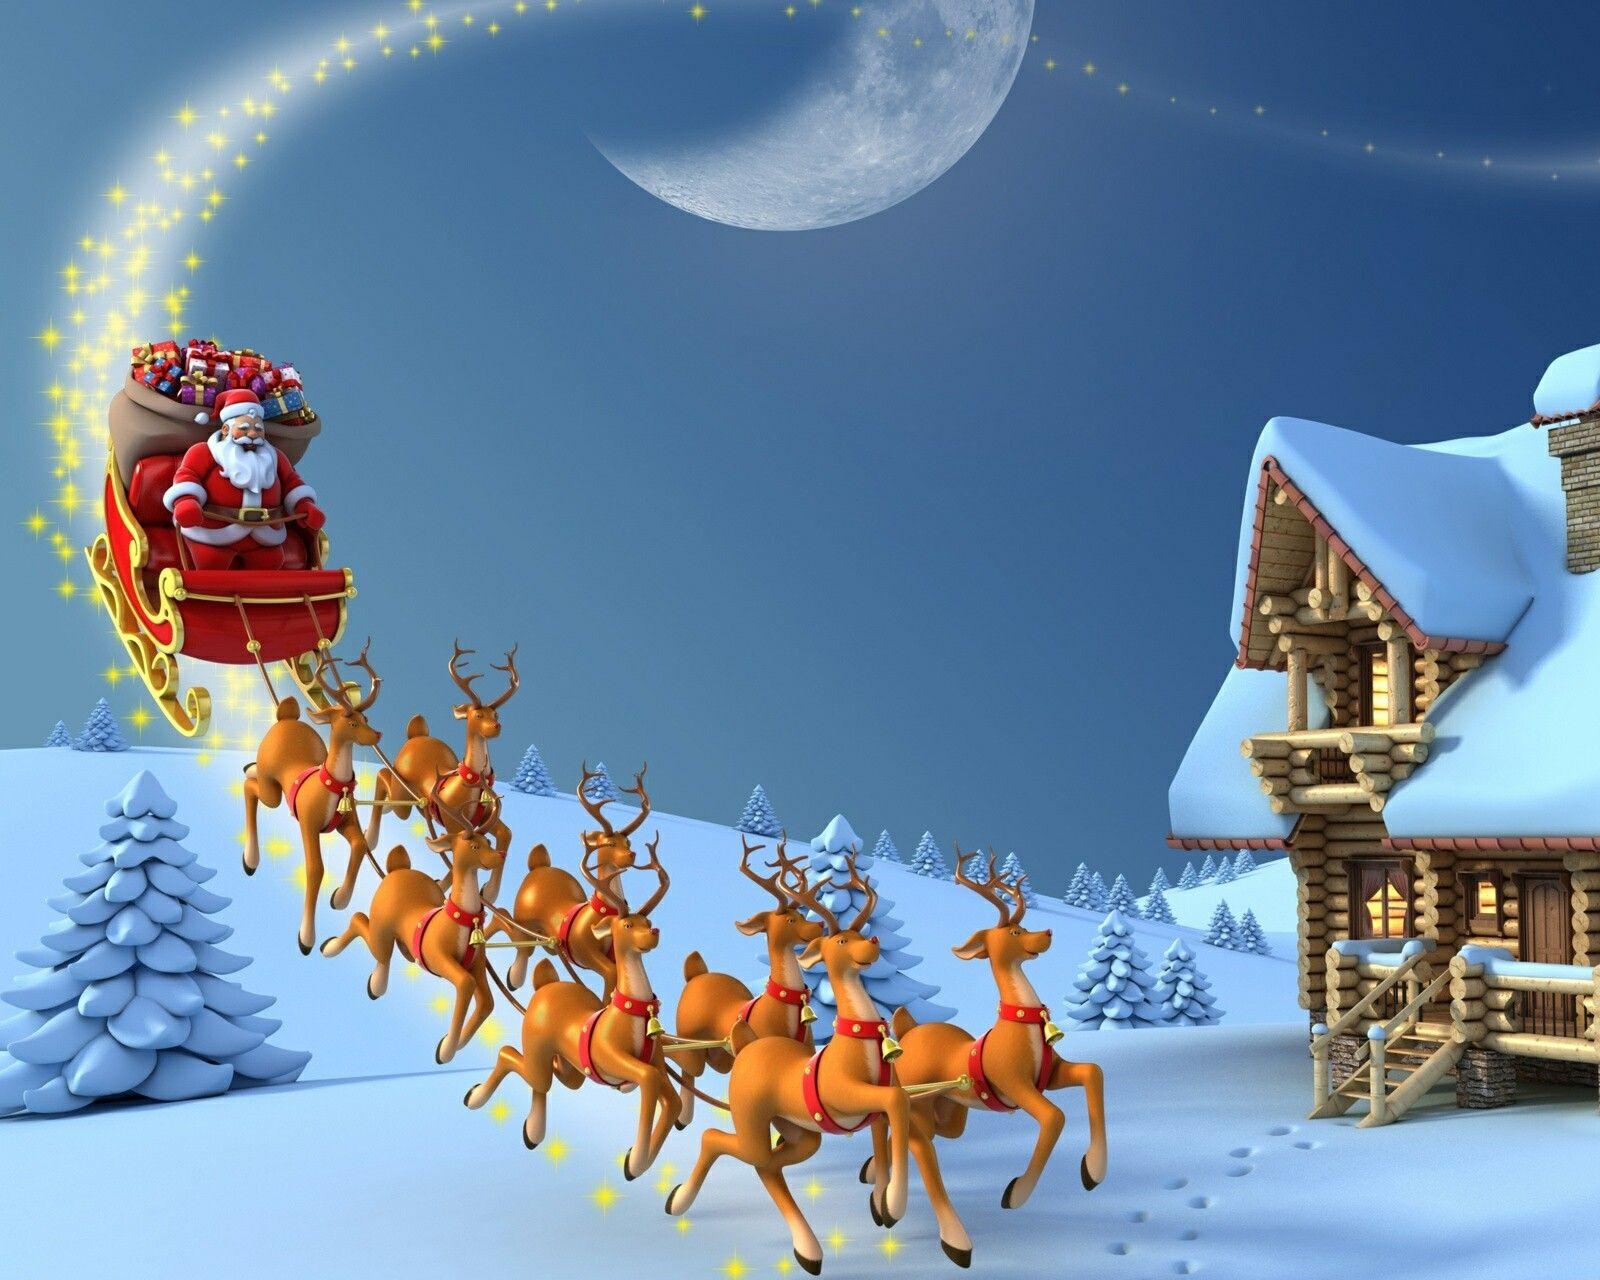 pinegon eilers on winterlandschaft  merry christmas